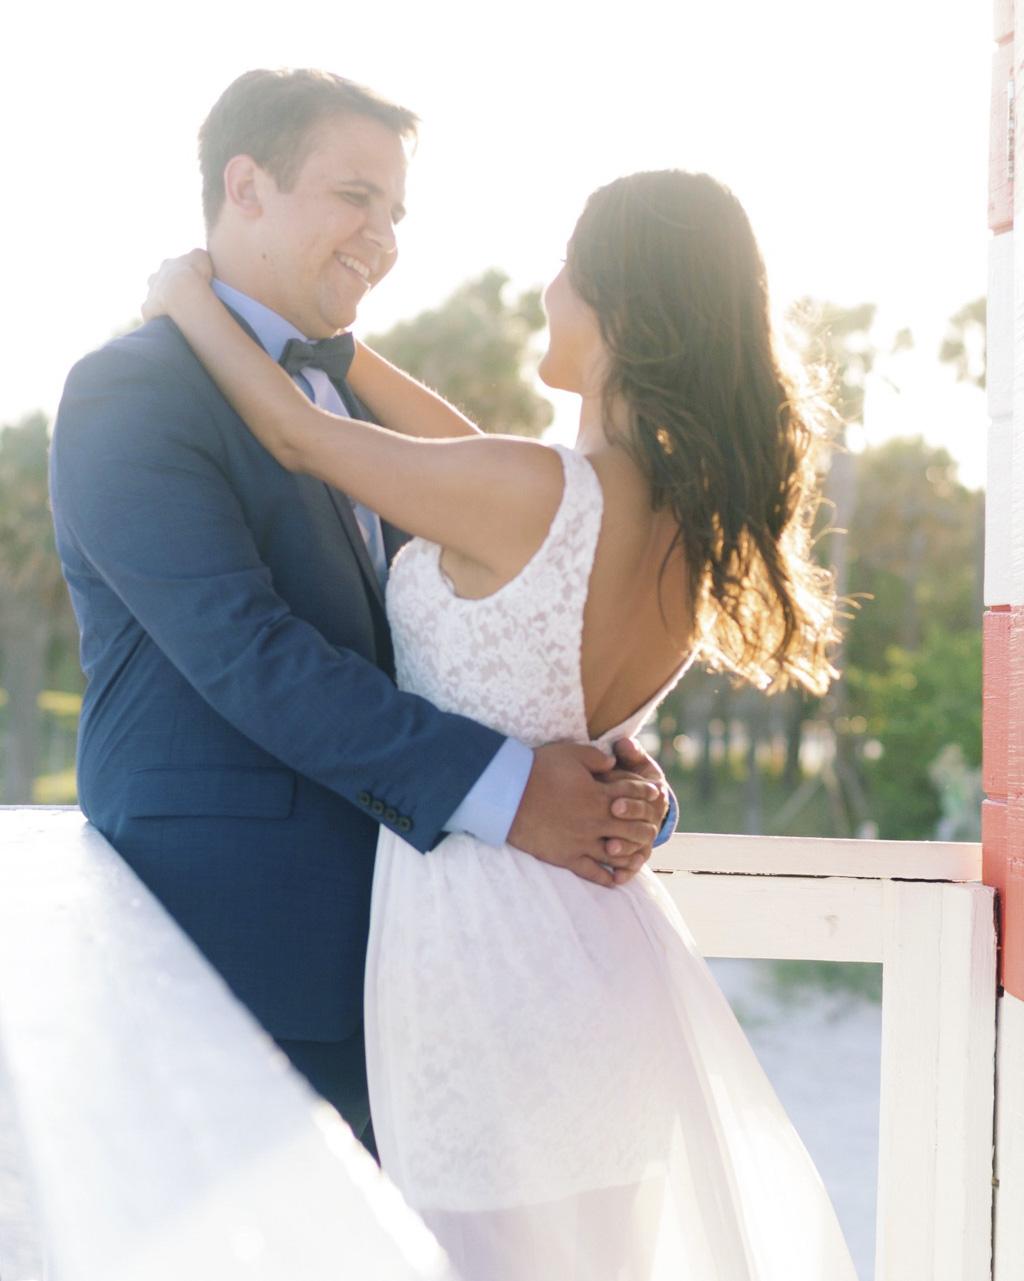 wedding-photographer-miami_5.jpg